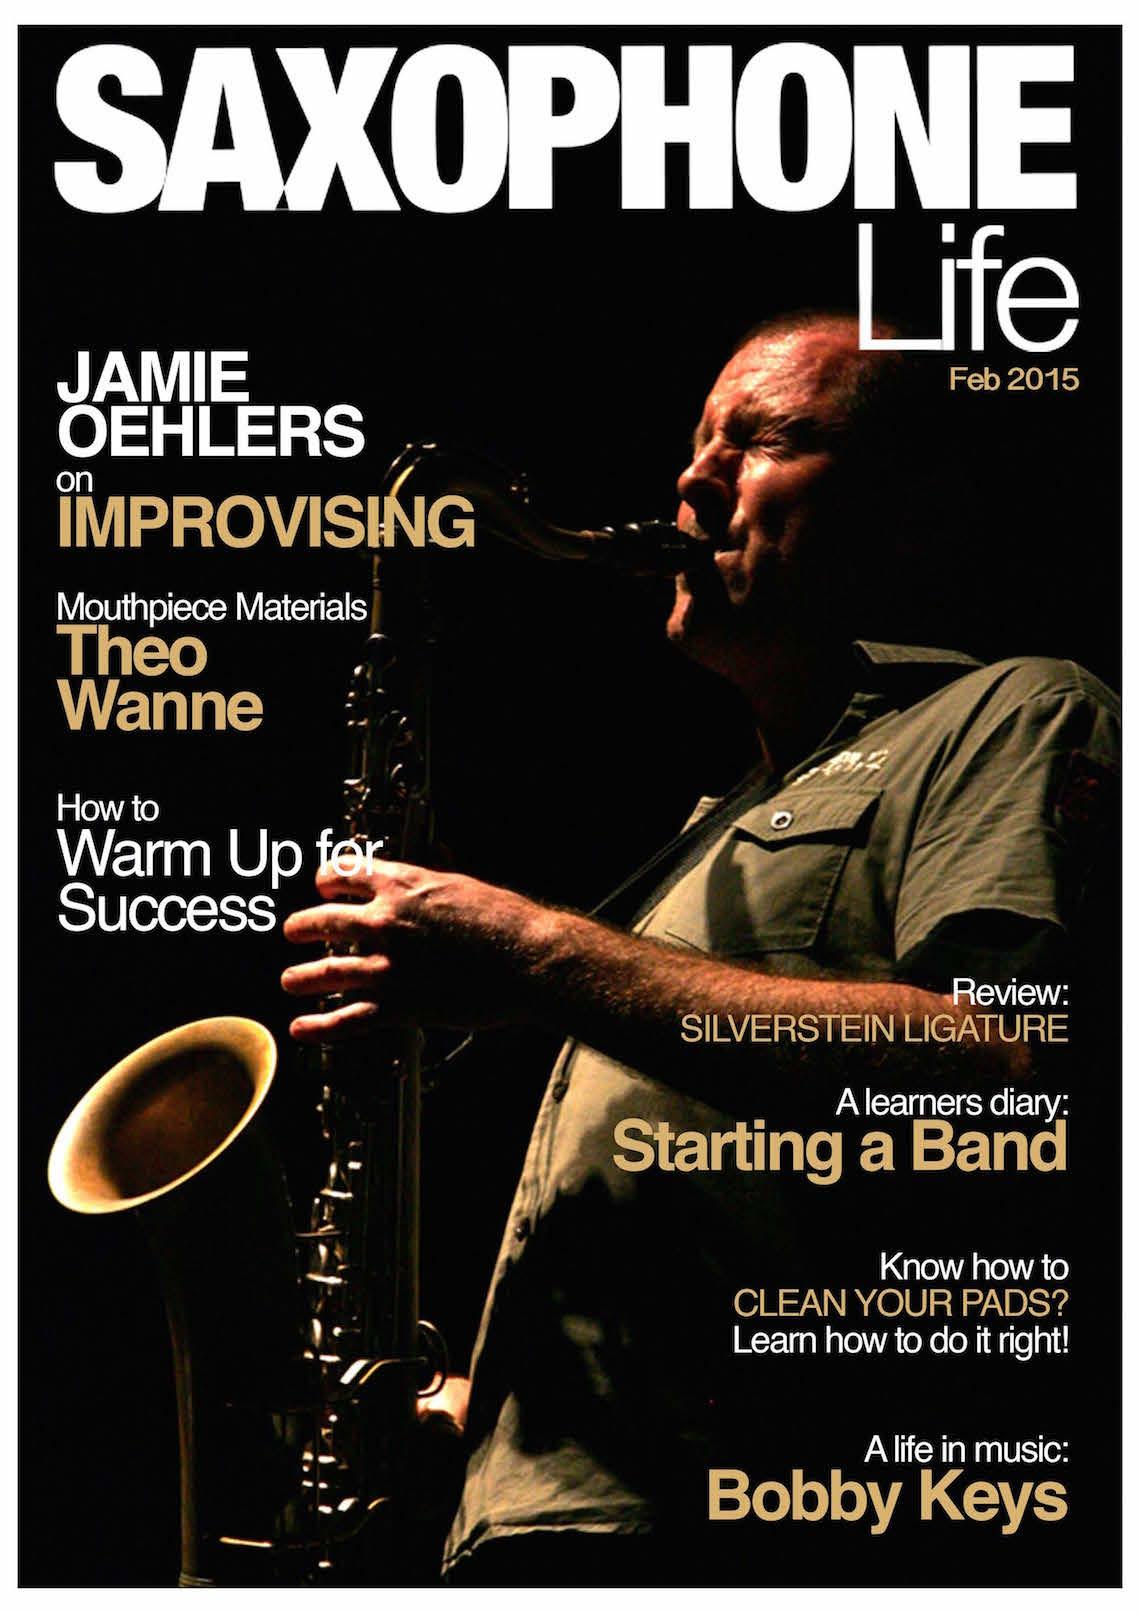 Saxophone Life Feb 2015 - Silverstein Works_Page_1